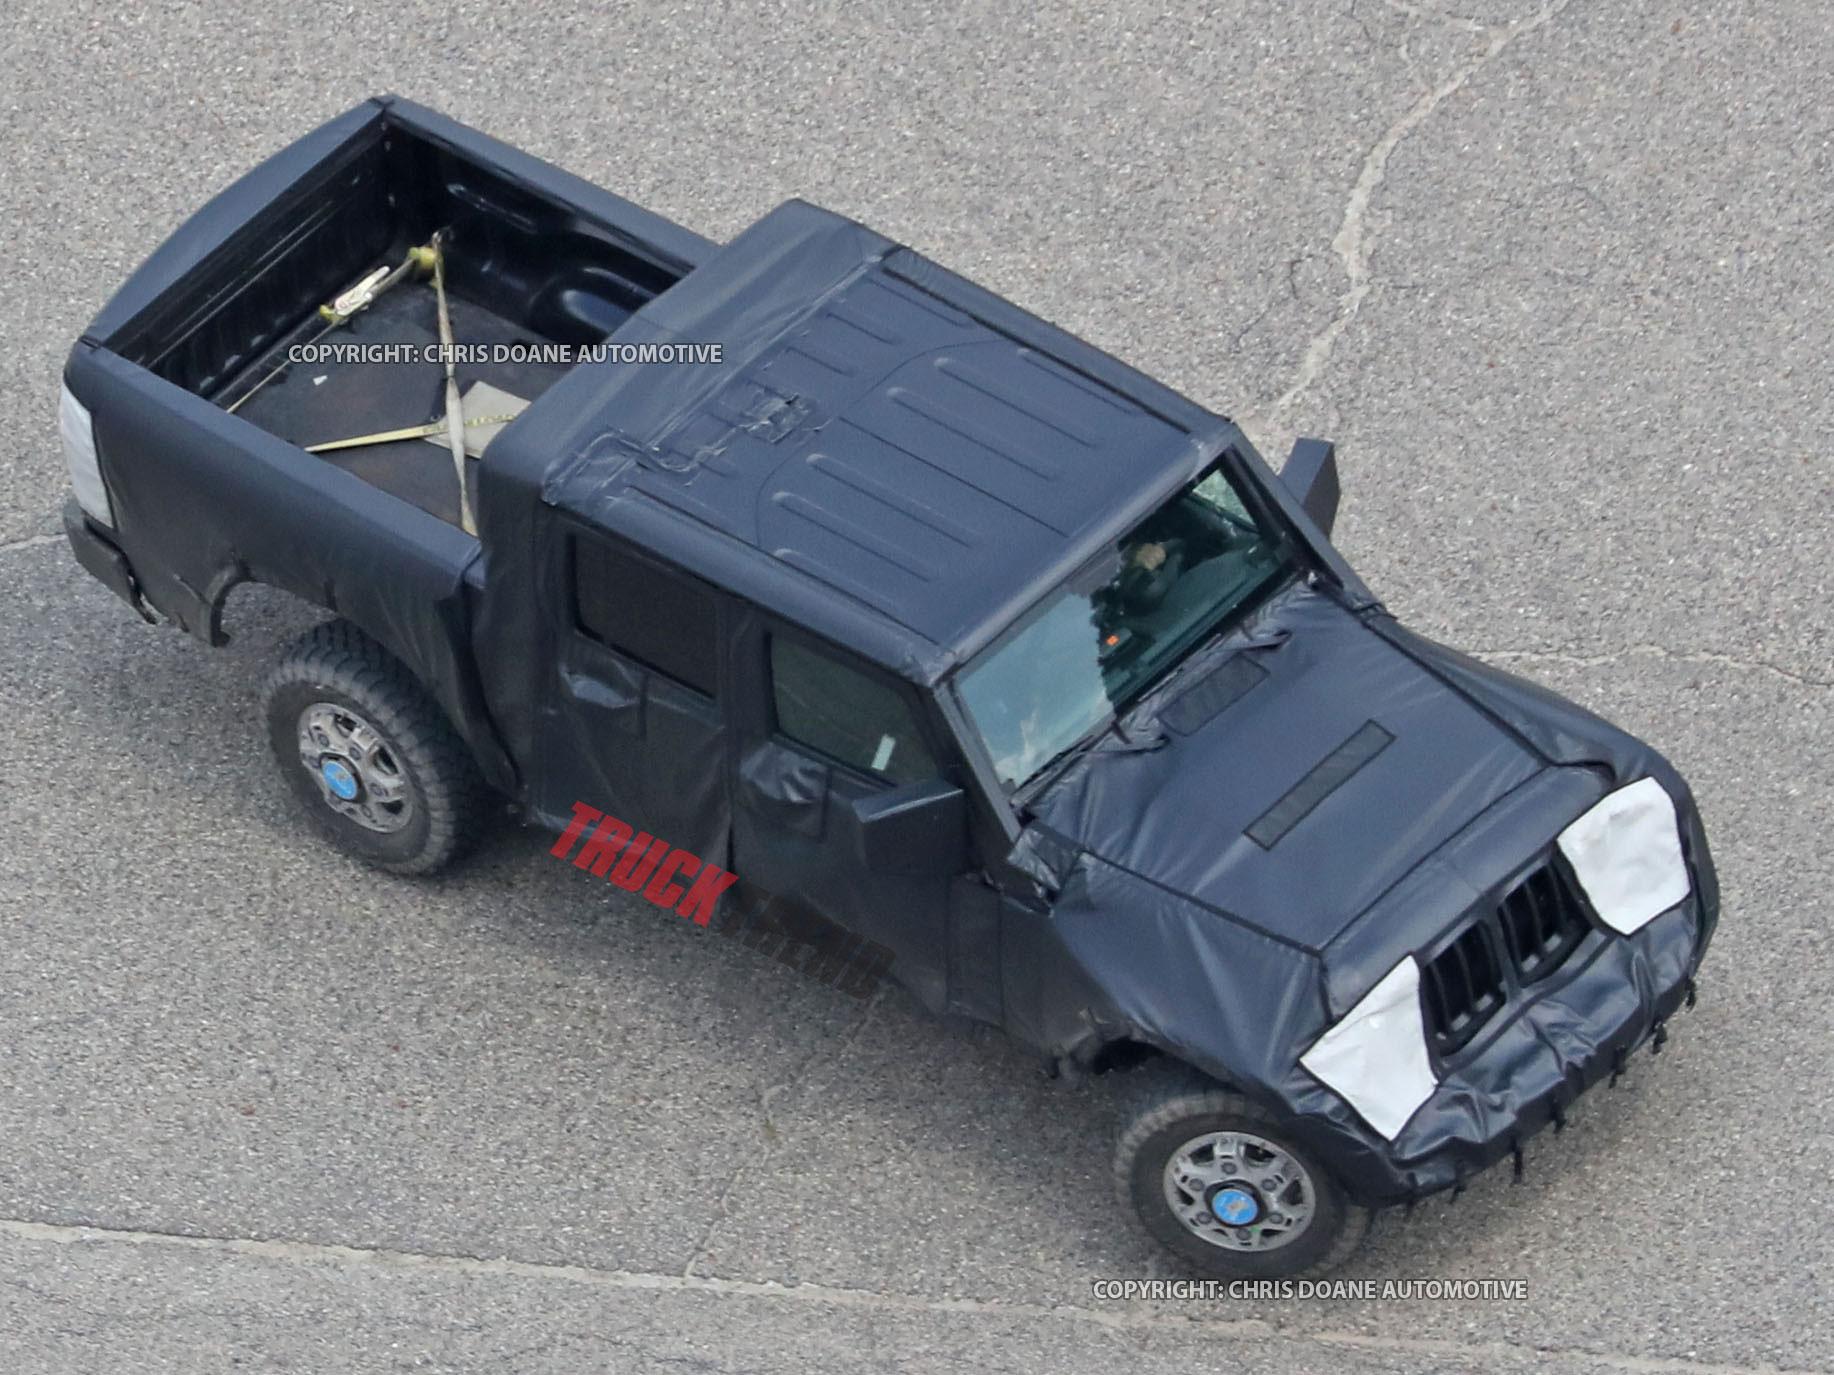 2019 Jeep Wrangler JL Pickup Spyshots 32